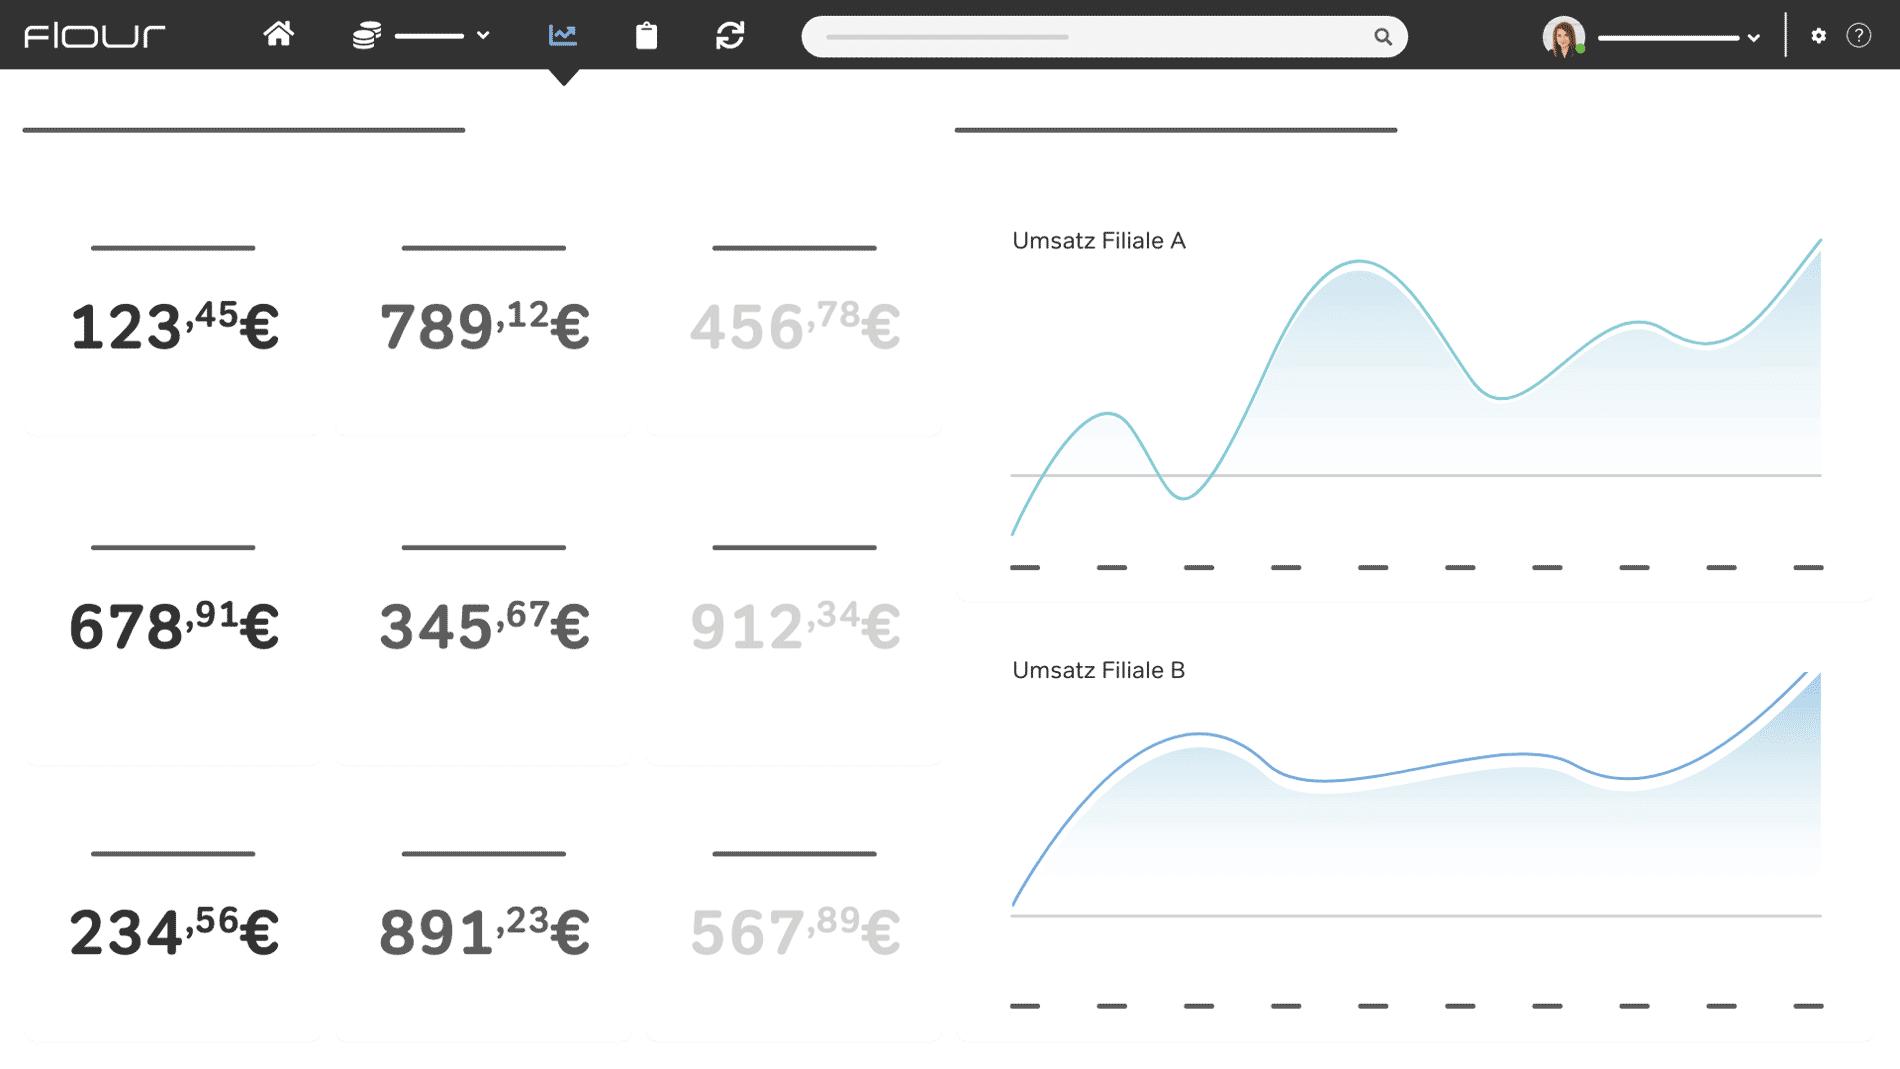 flour Kassensystem Screenshot Statistiken und Auswertungen